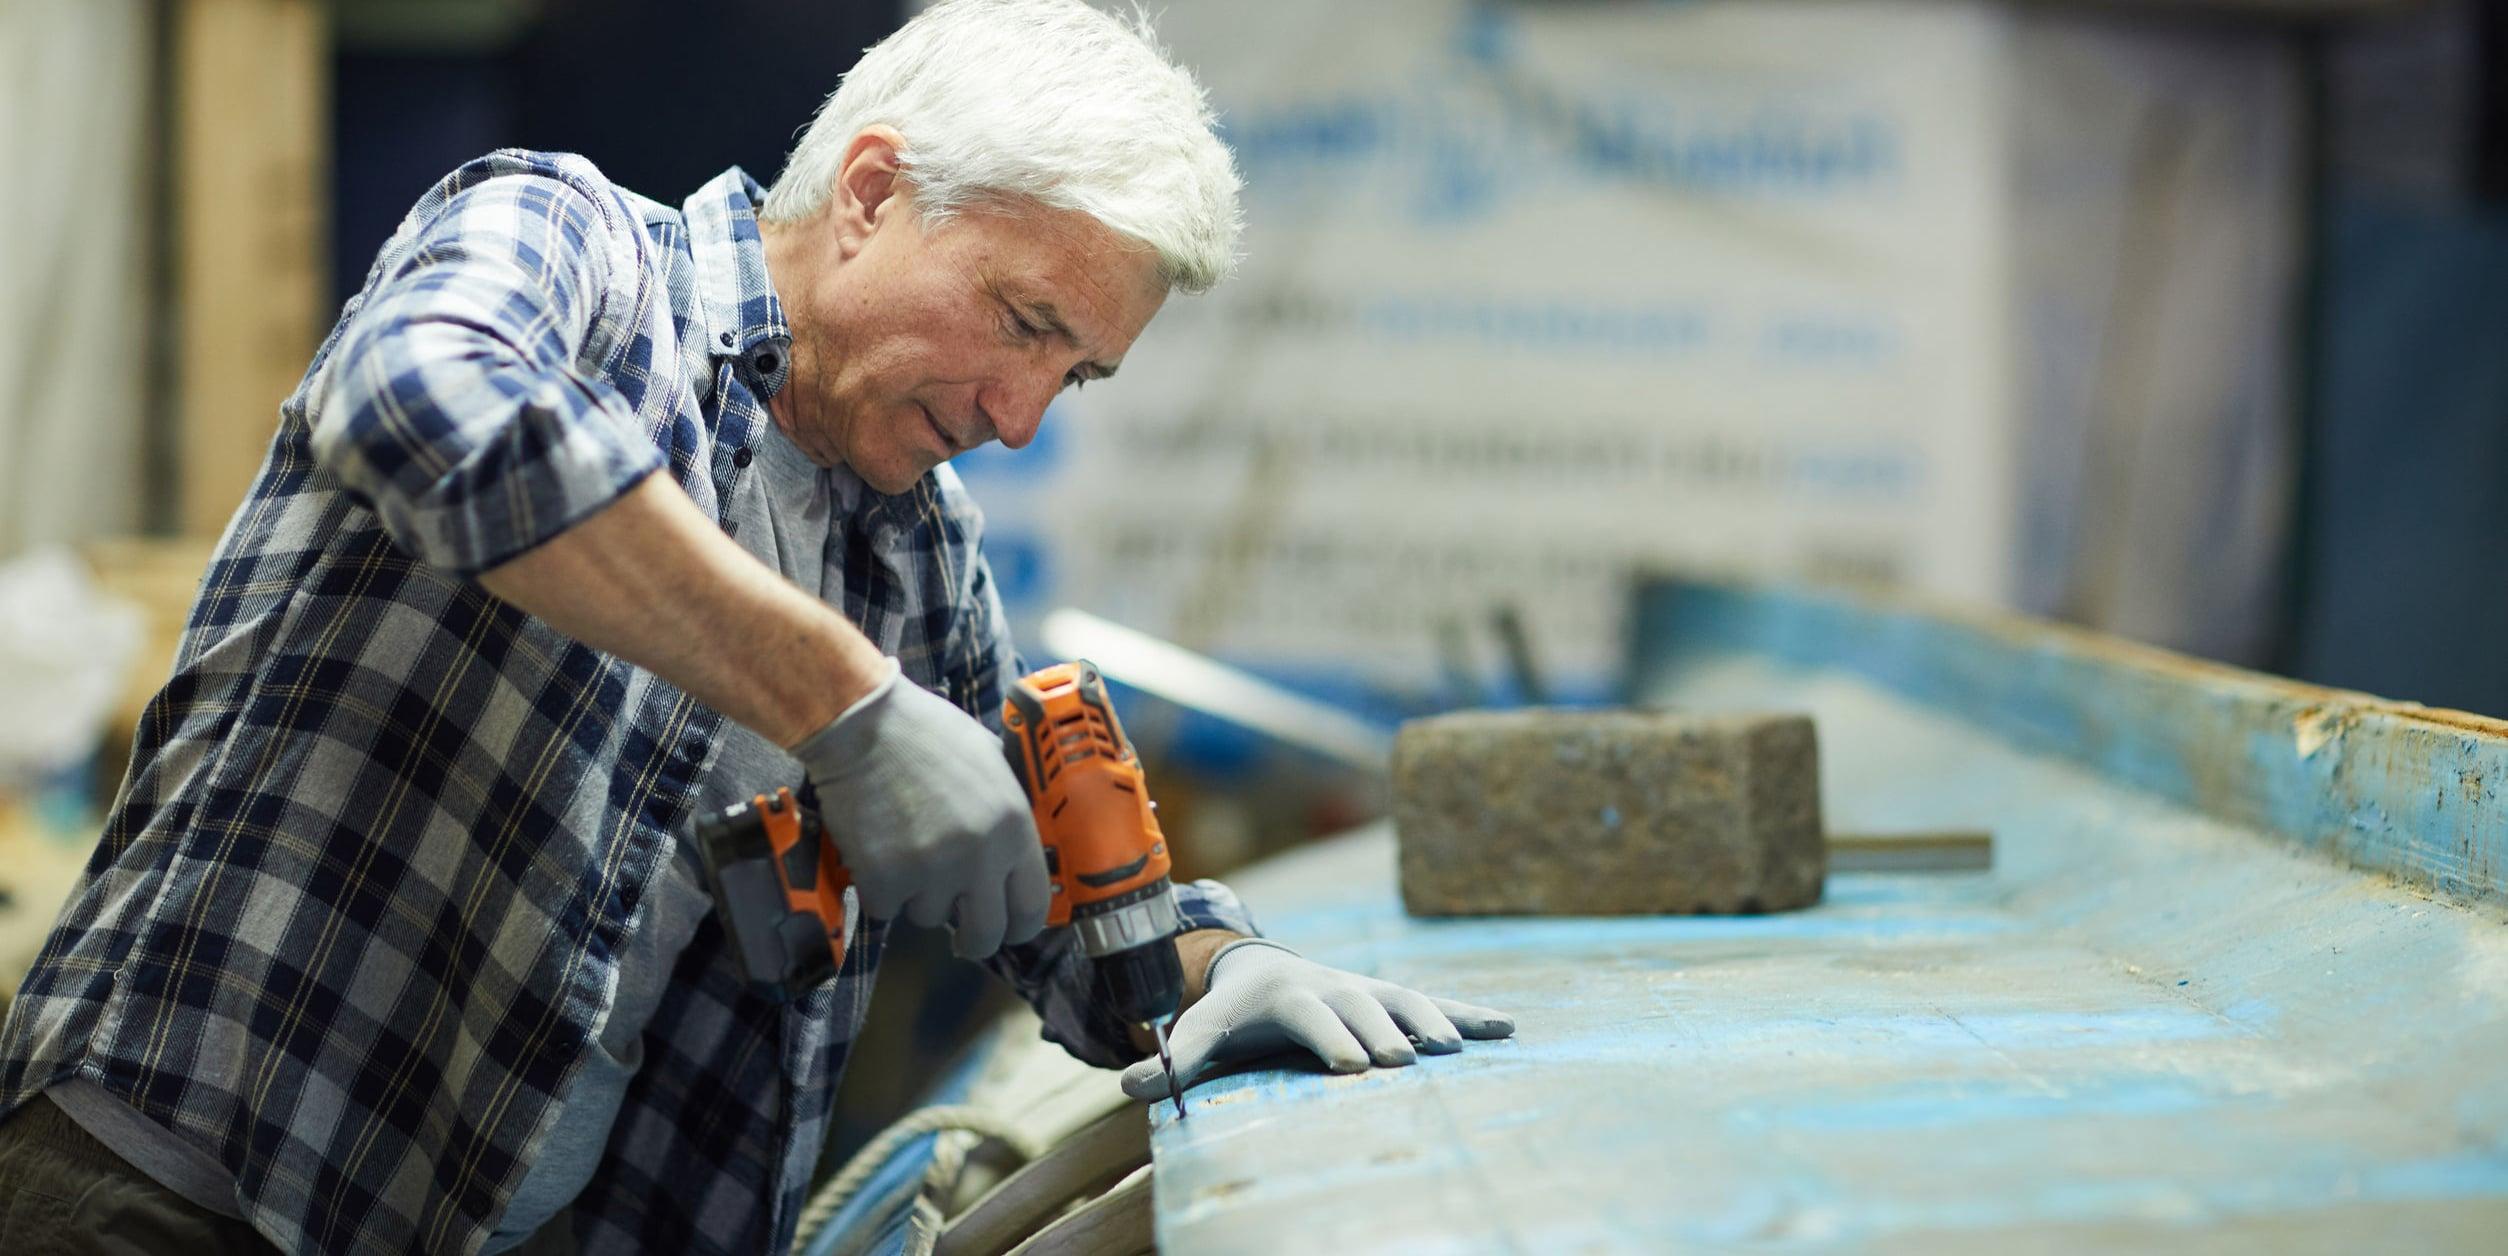 Man working in shipyard